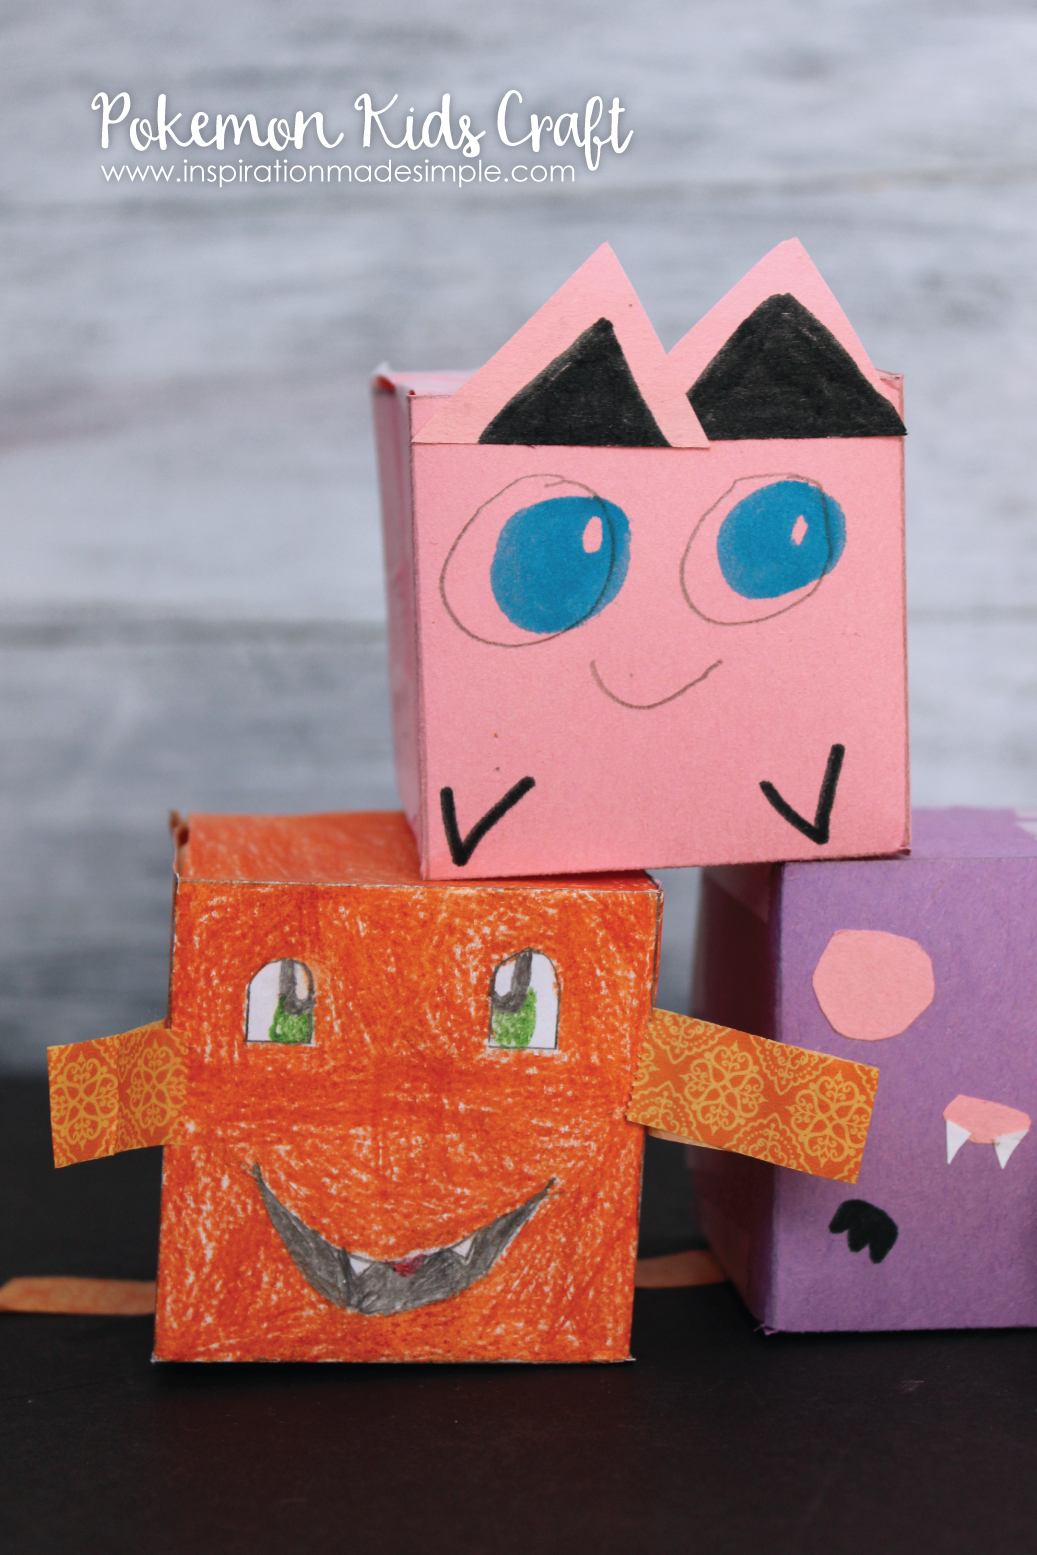 Pokemon Kids Craft - kid created, kid approved!